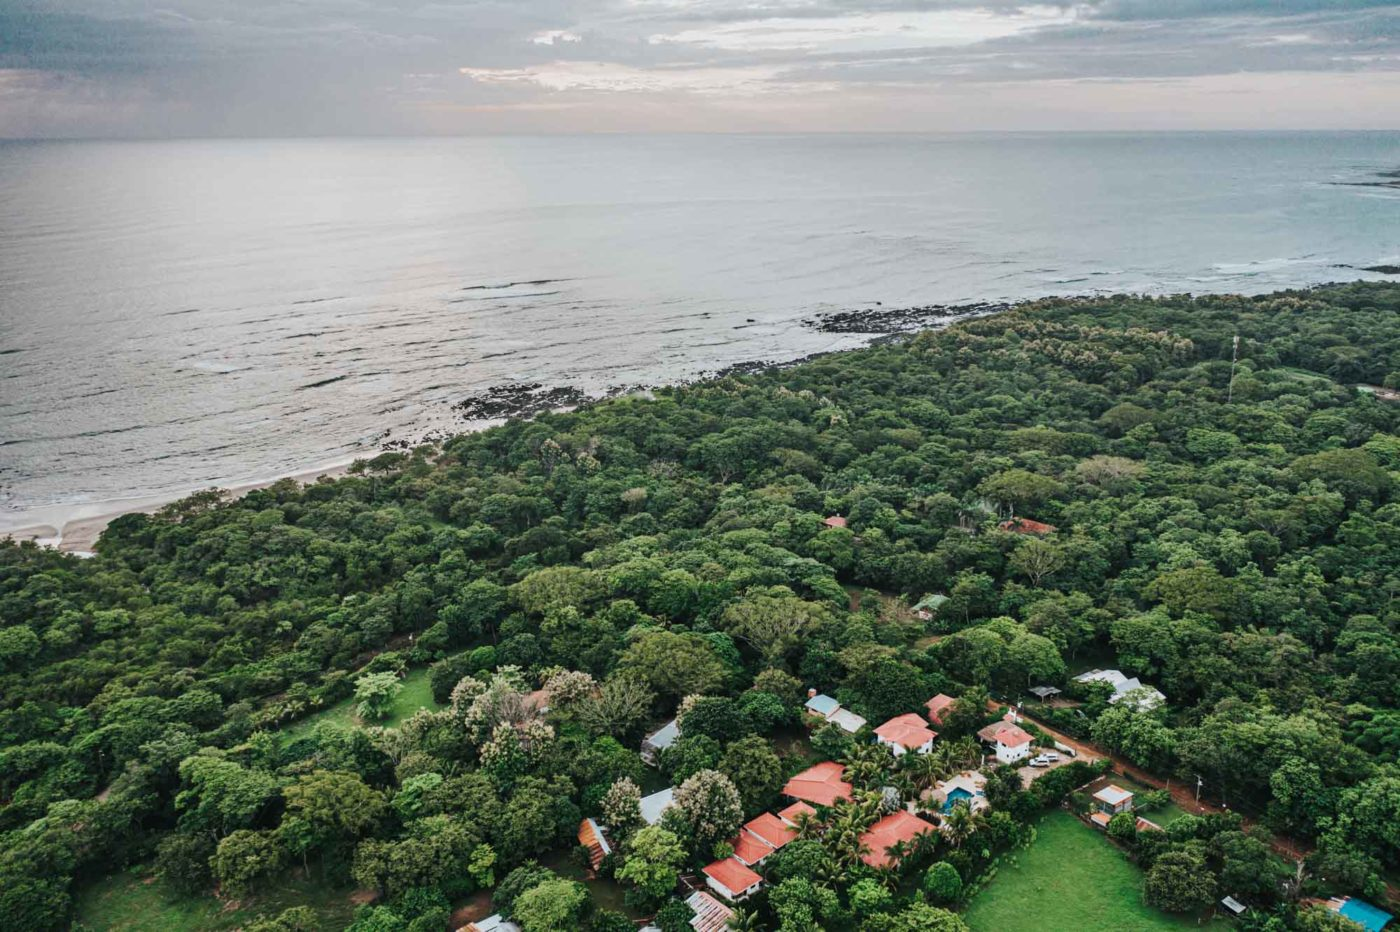 Drift Away Eco Lodge, Playa Lagartillo, Playa Avellanas, Guanacaste, Costa Rica